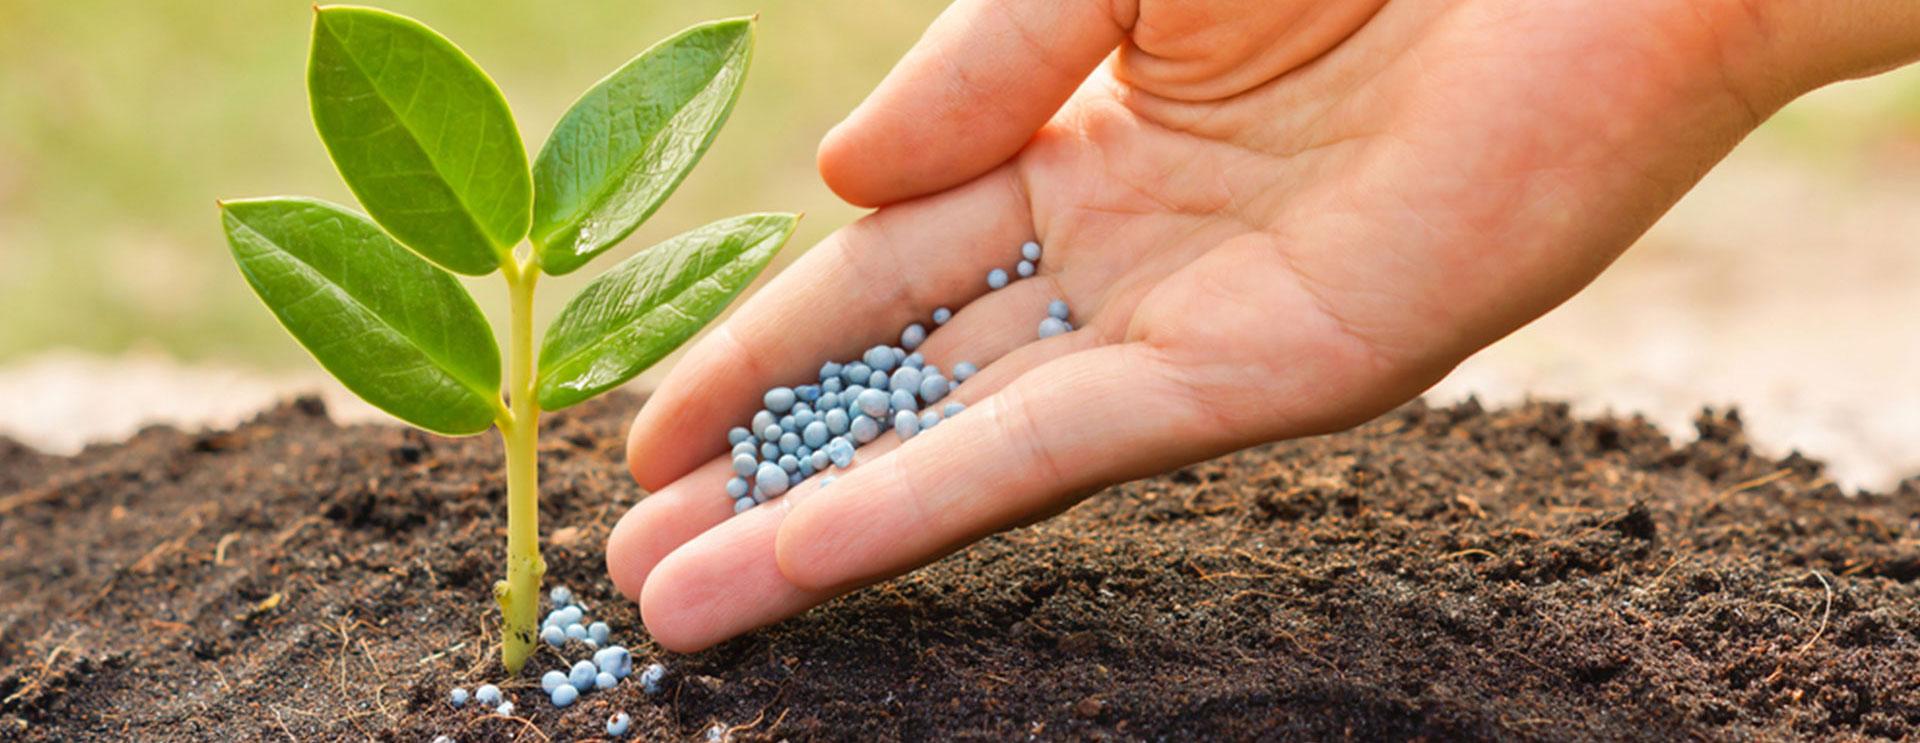 FG to slash fertiliser price